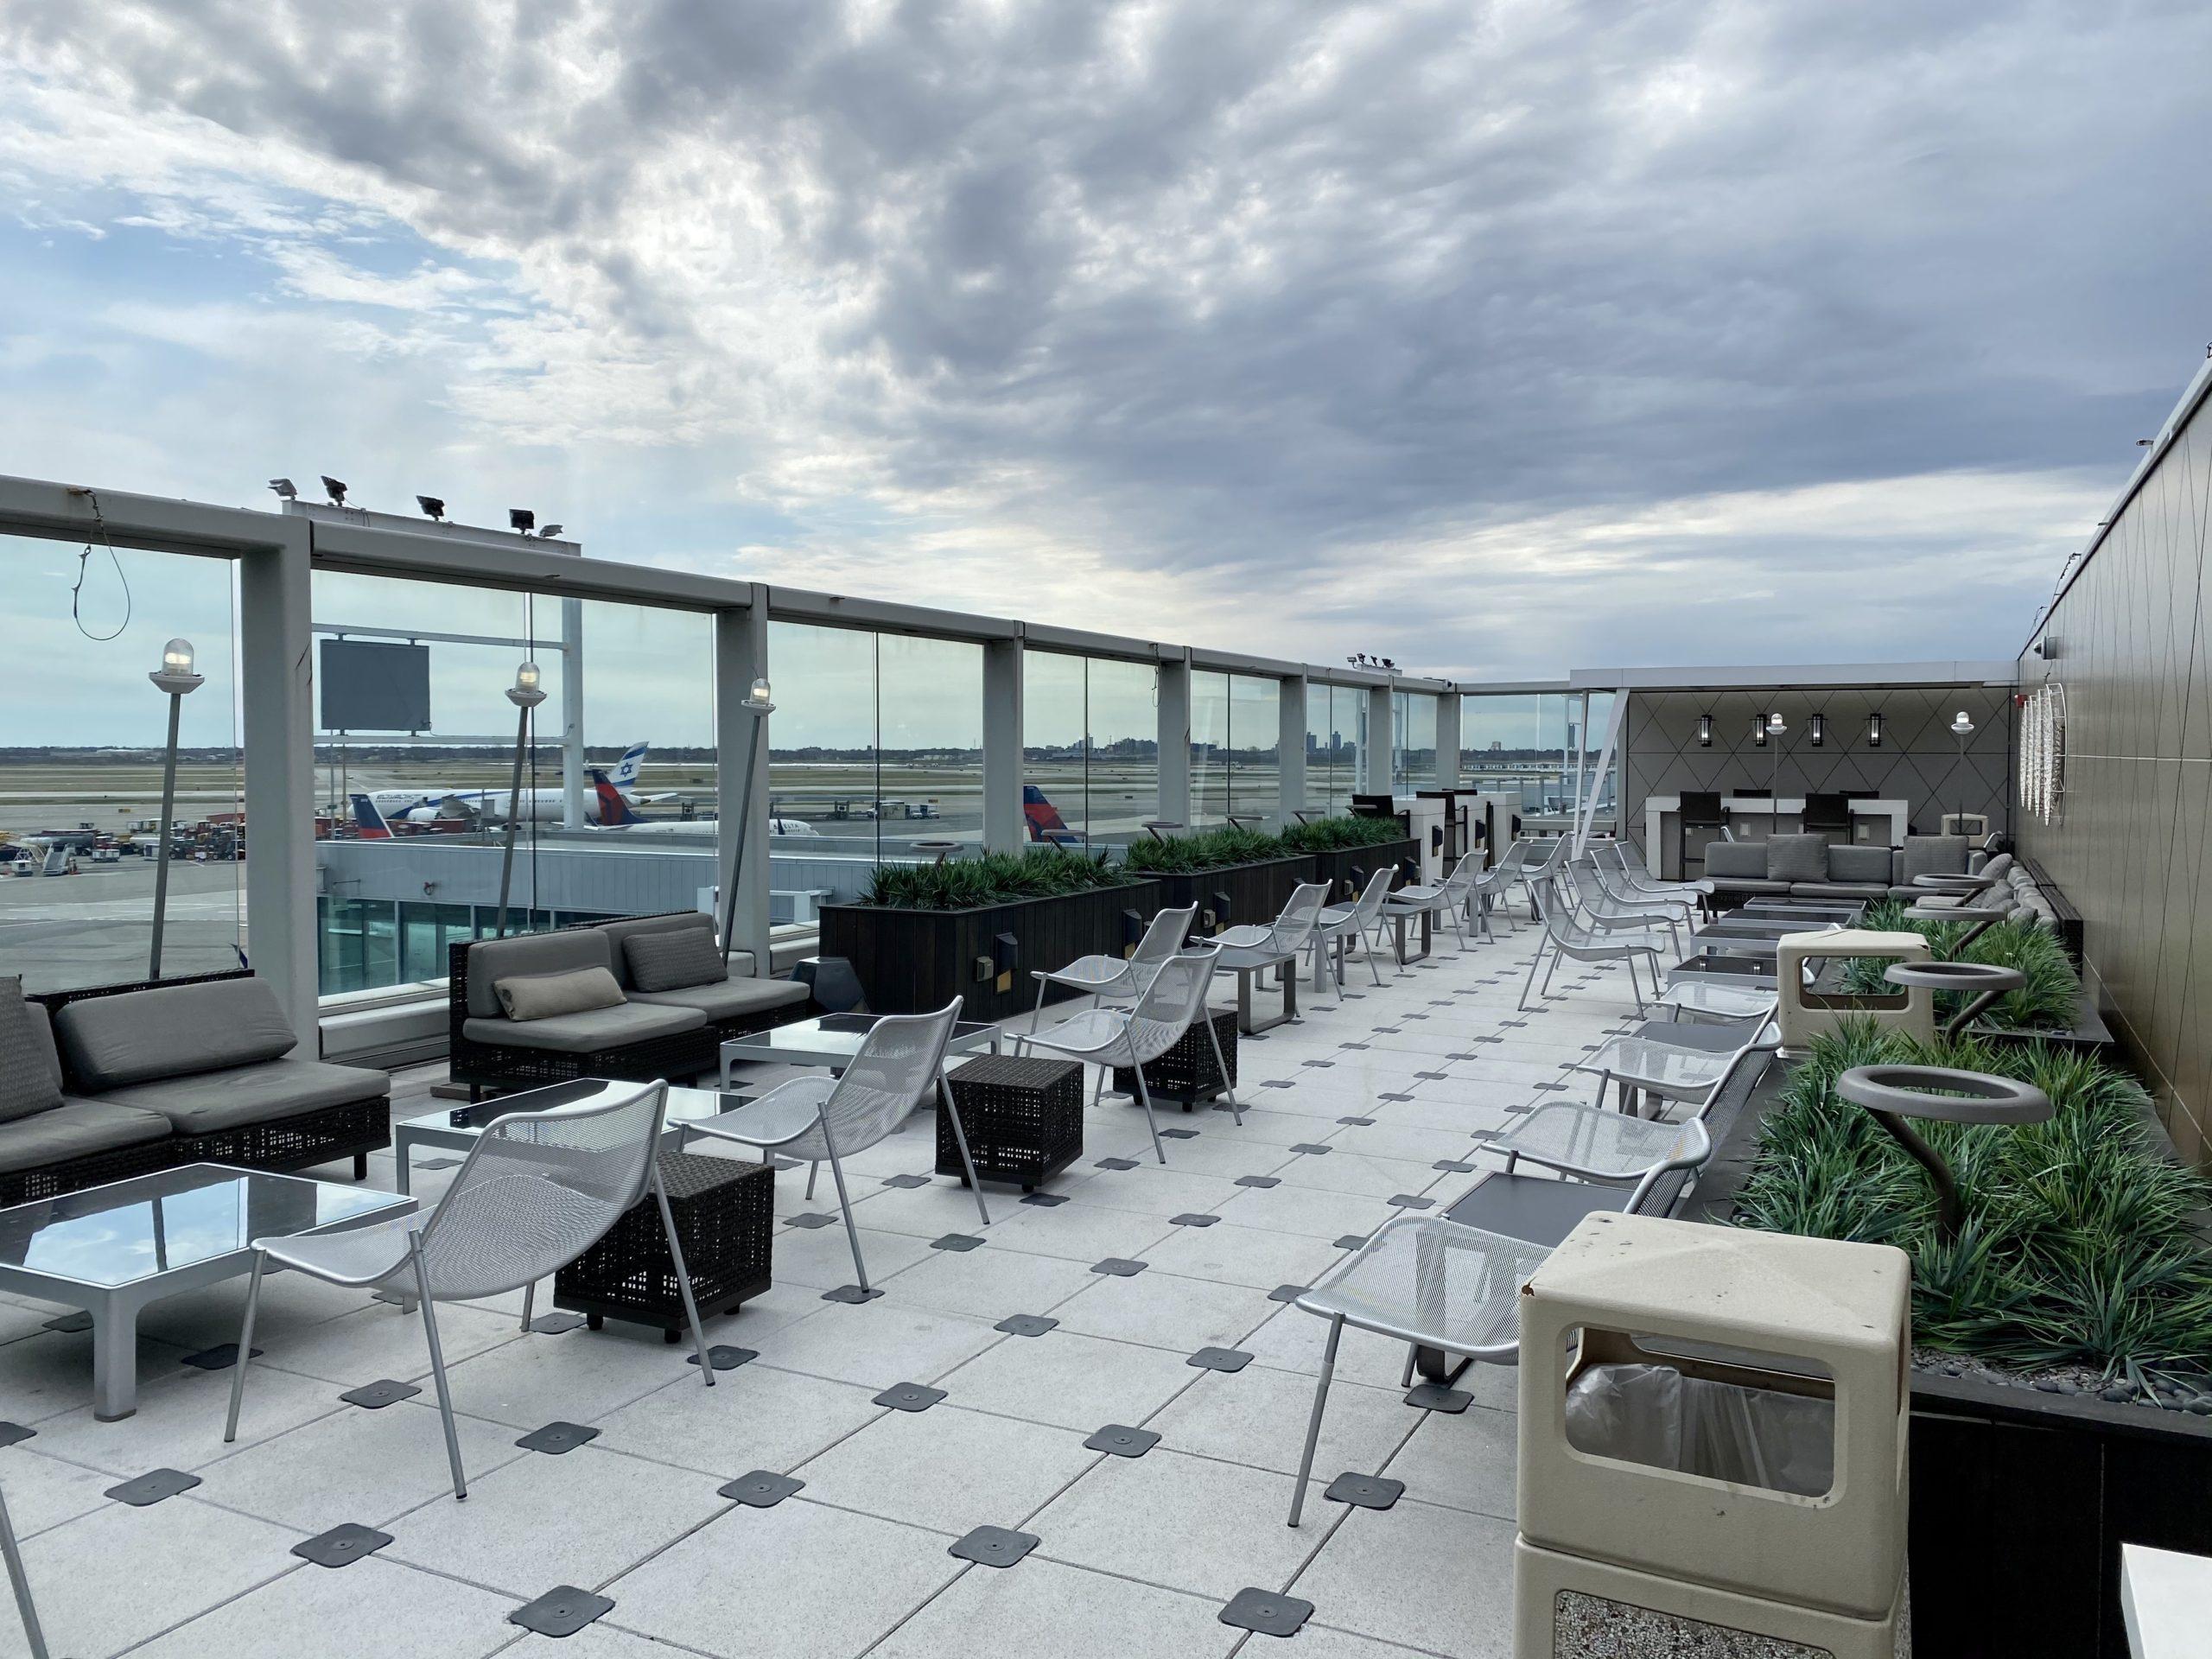 JFK sky club deck